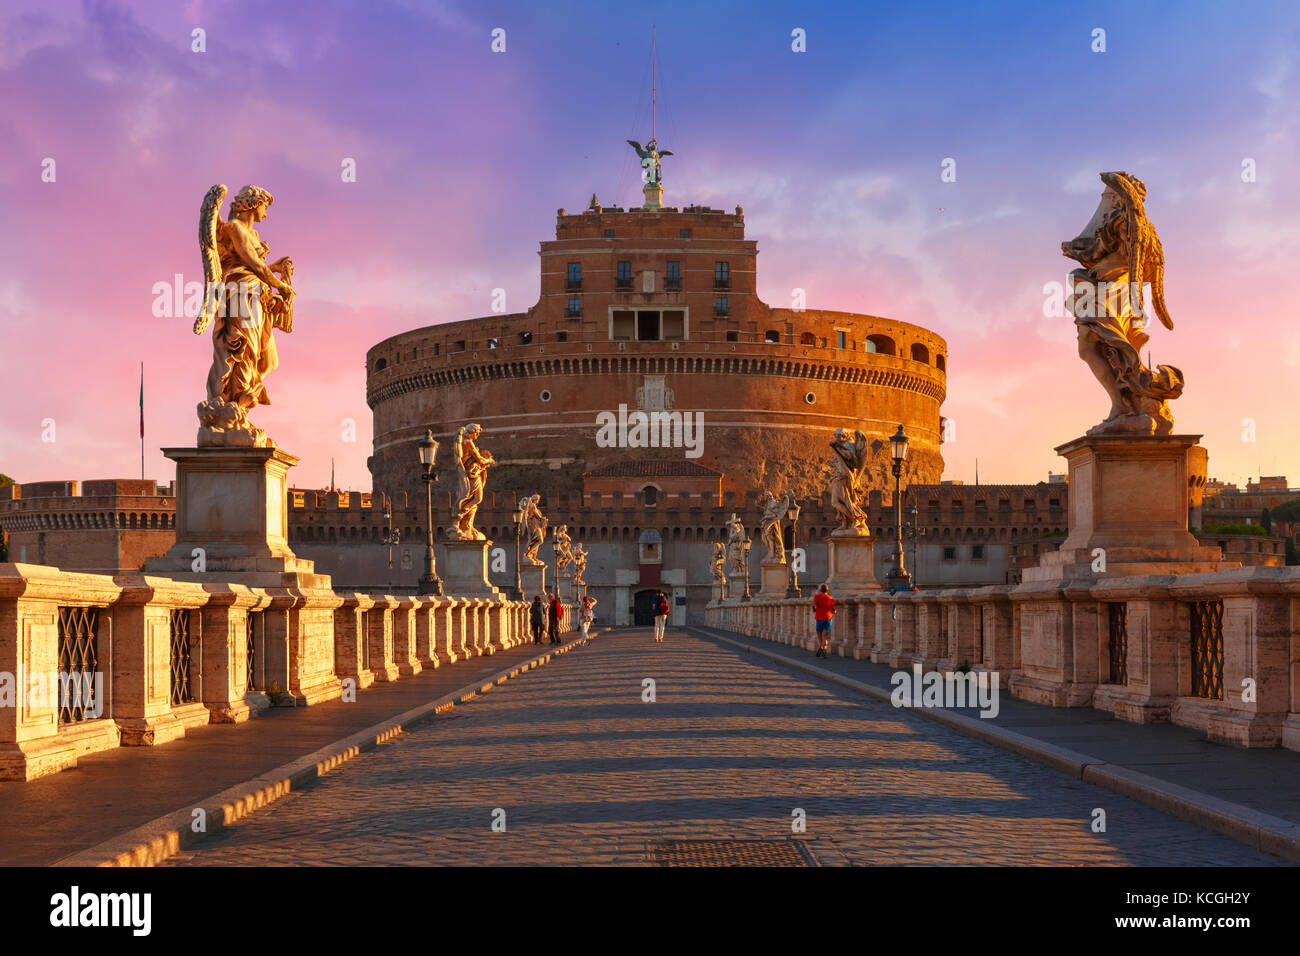 Saint Angel castle and bridge, Rome, Italy - Stock Image